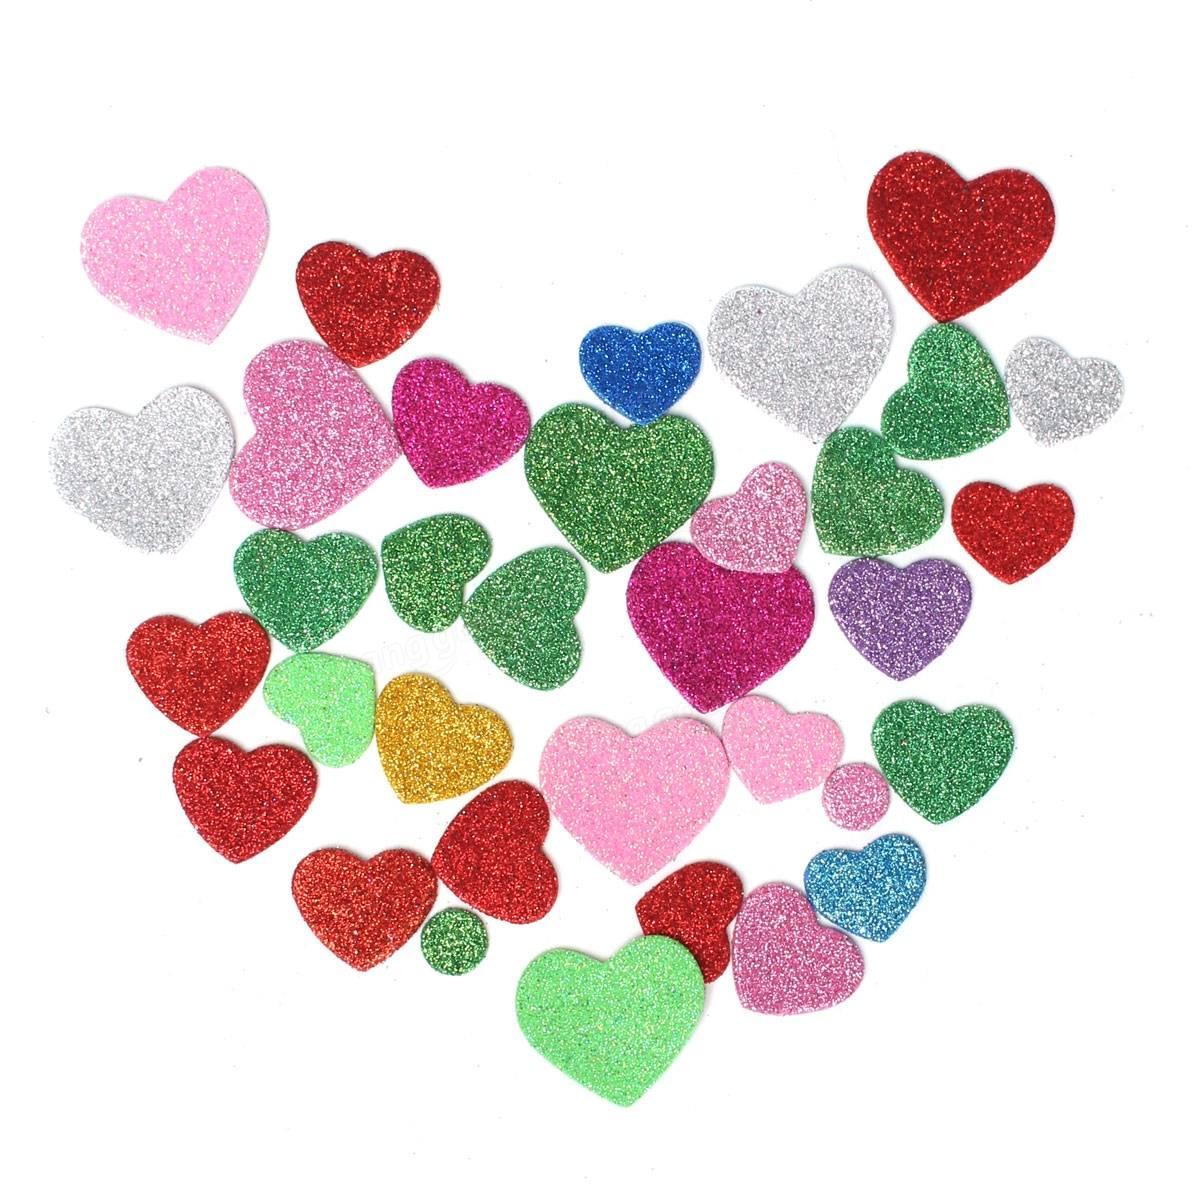 1200x1200 30pcs Assorted Glitter Shapes Hearts Stars Round Flowers Foam